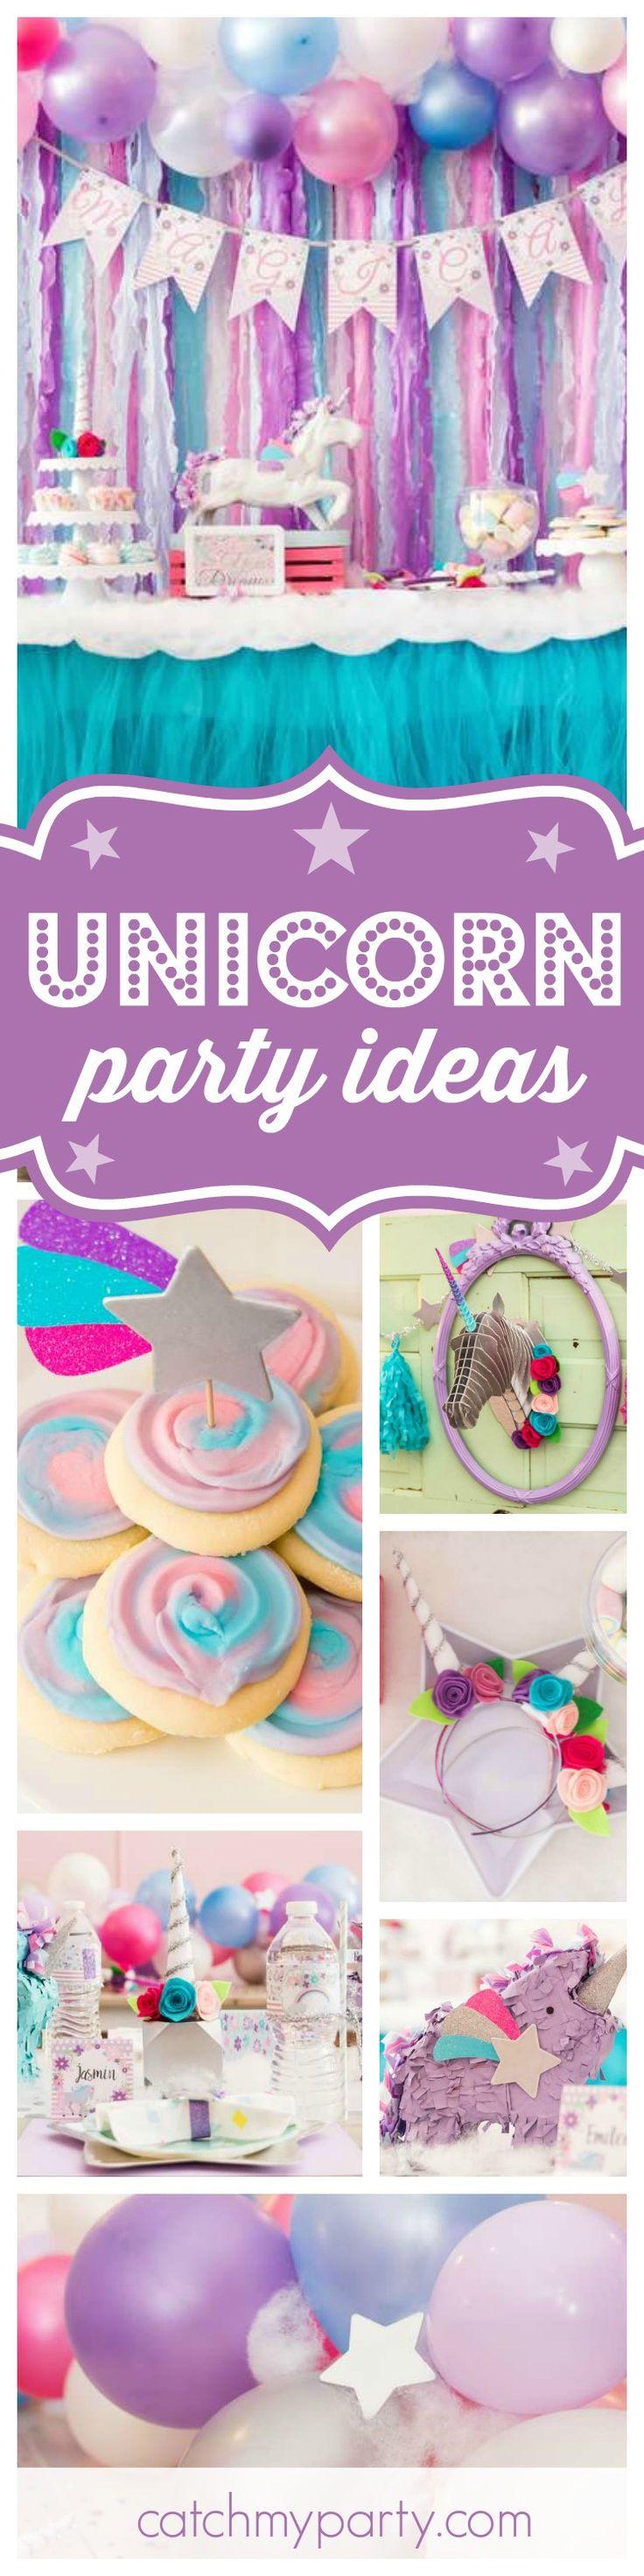 best party ideas images on pinterest unicorn party birthdays